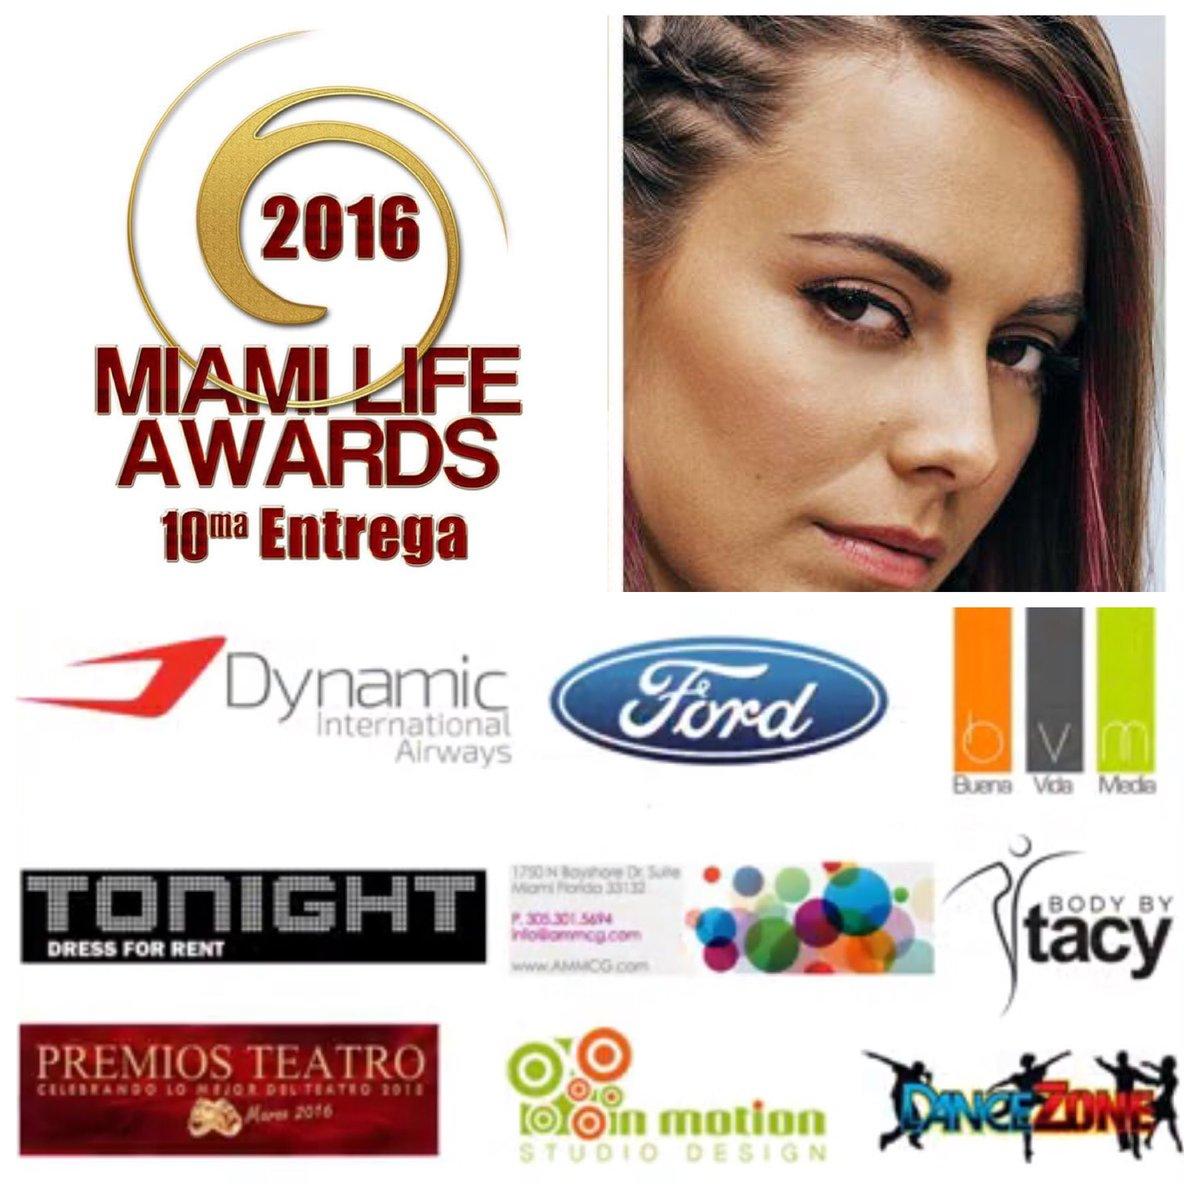 #MiamiLifeAwards 10ma Entrega - Telenovela Actriz Protagonista del Año gana @MariaECamargo  #BajoElMismoCielo #TLMD https://t.co/PPWi7FTOFN